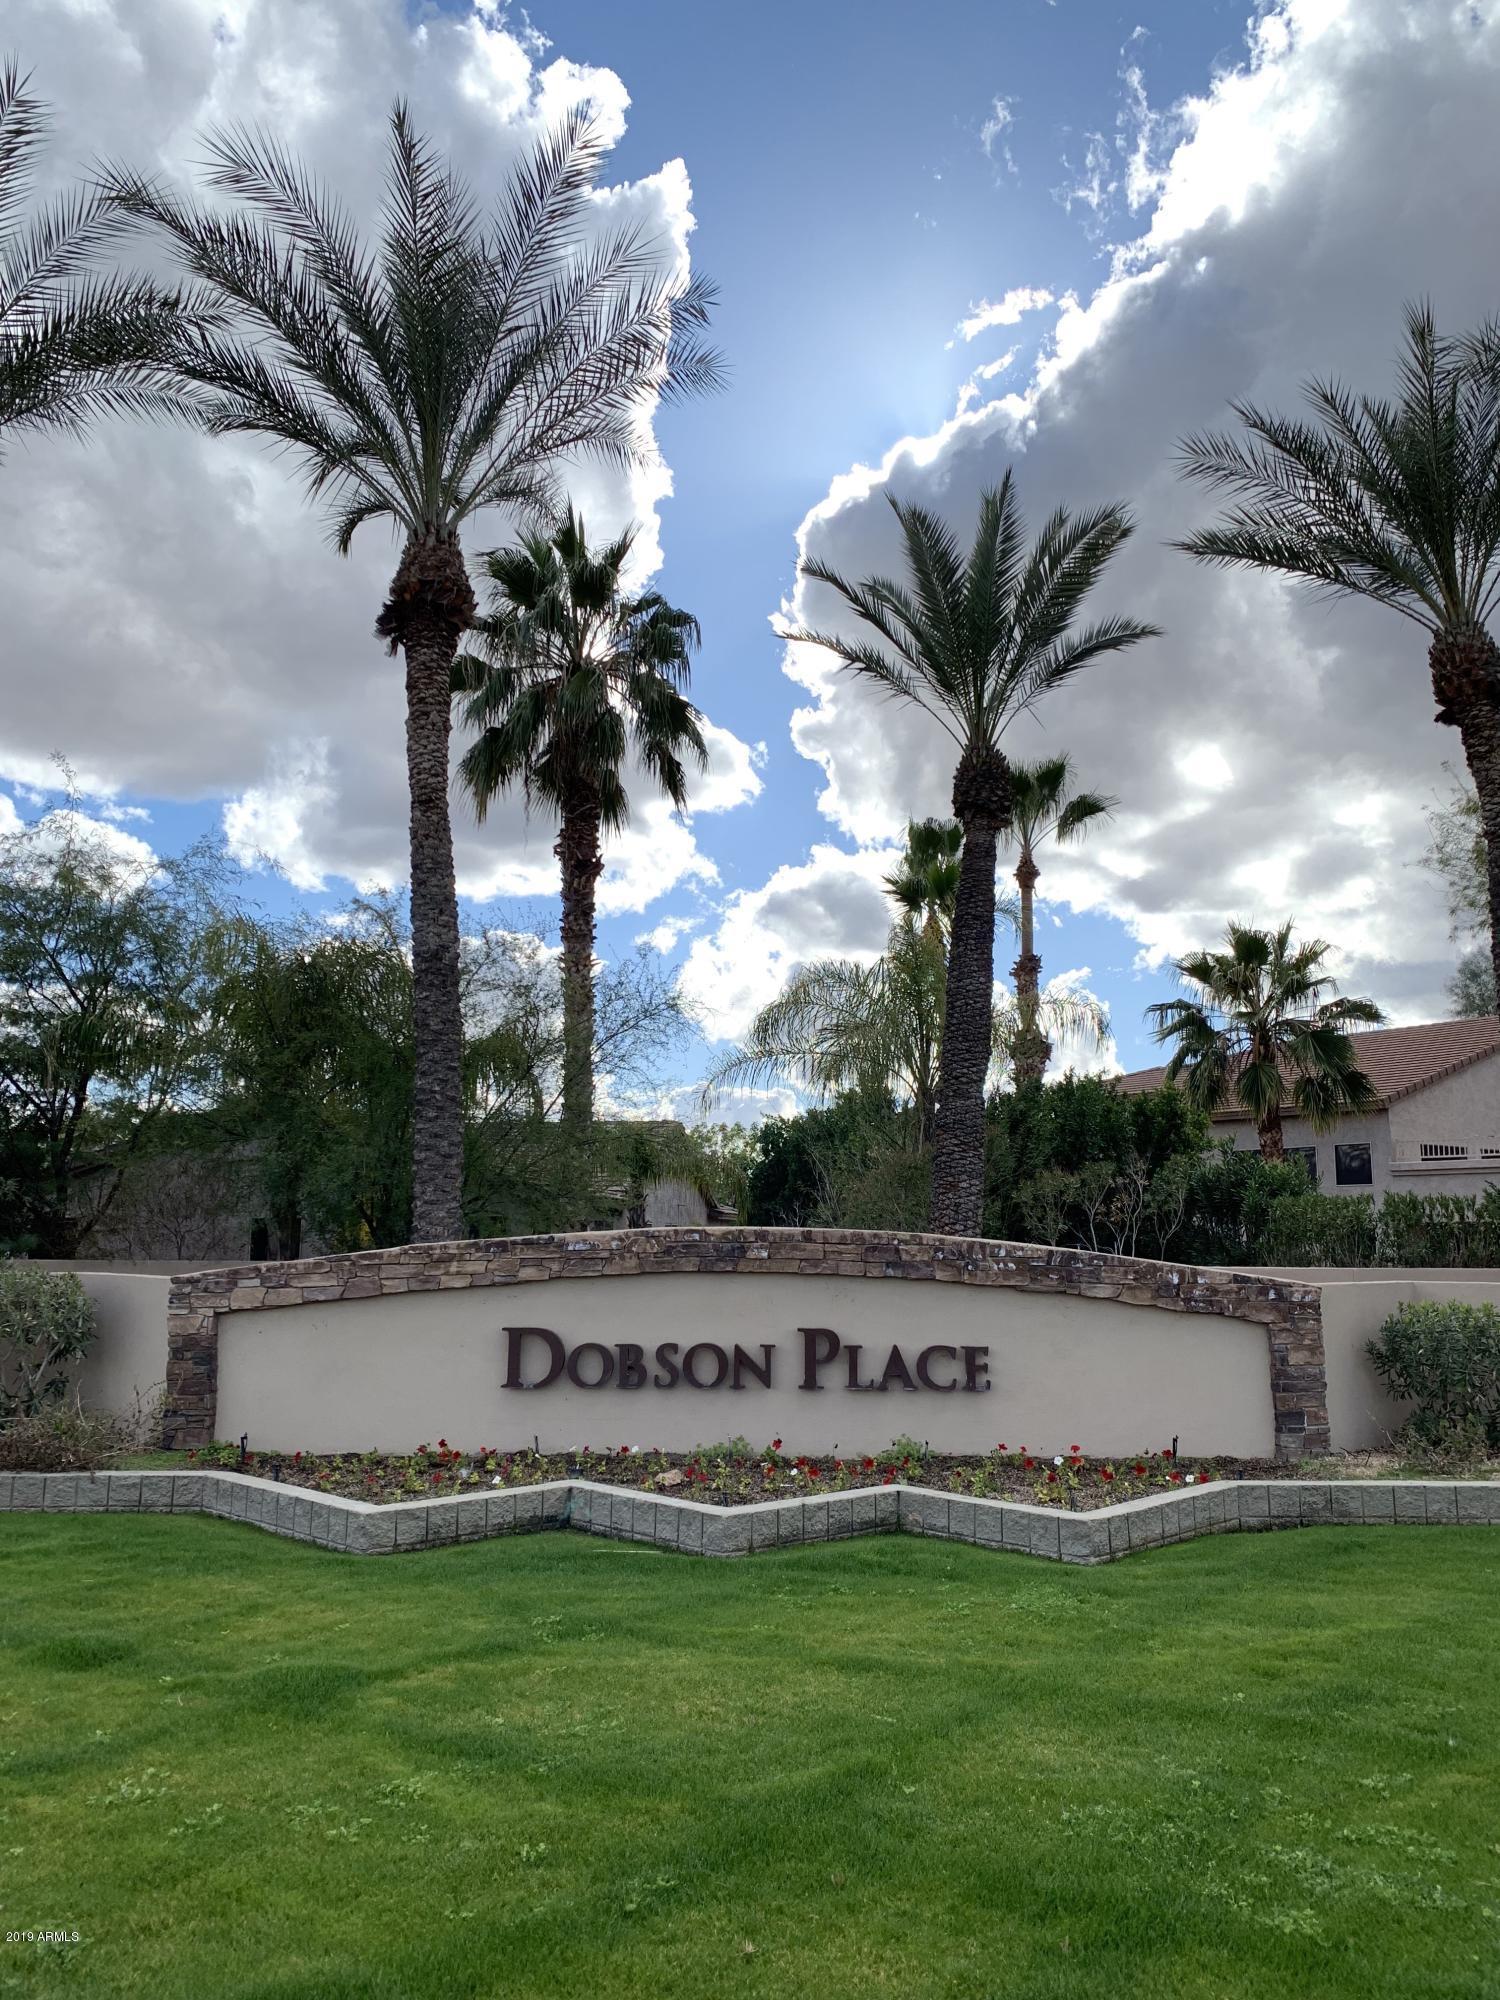 MLS 5886040 2910 E CARLA VISTA Drive, Chandler, AZ 85225 Chandler AZ Dobson Place